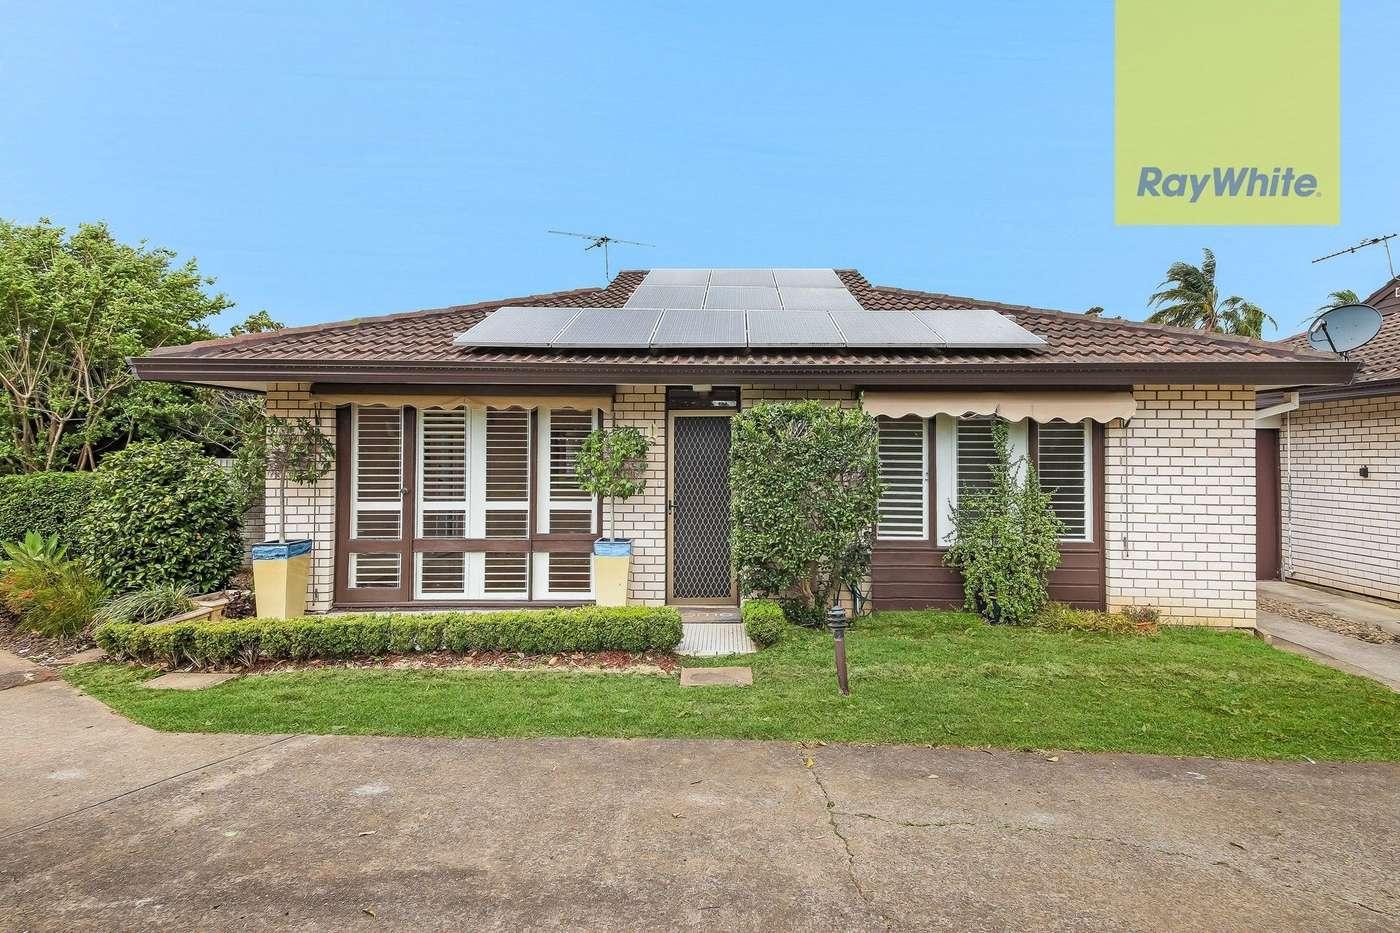 Main view of Homely villa listing, 9/50 Marsden Road, Ermington, NSW 2115